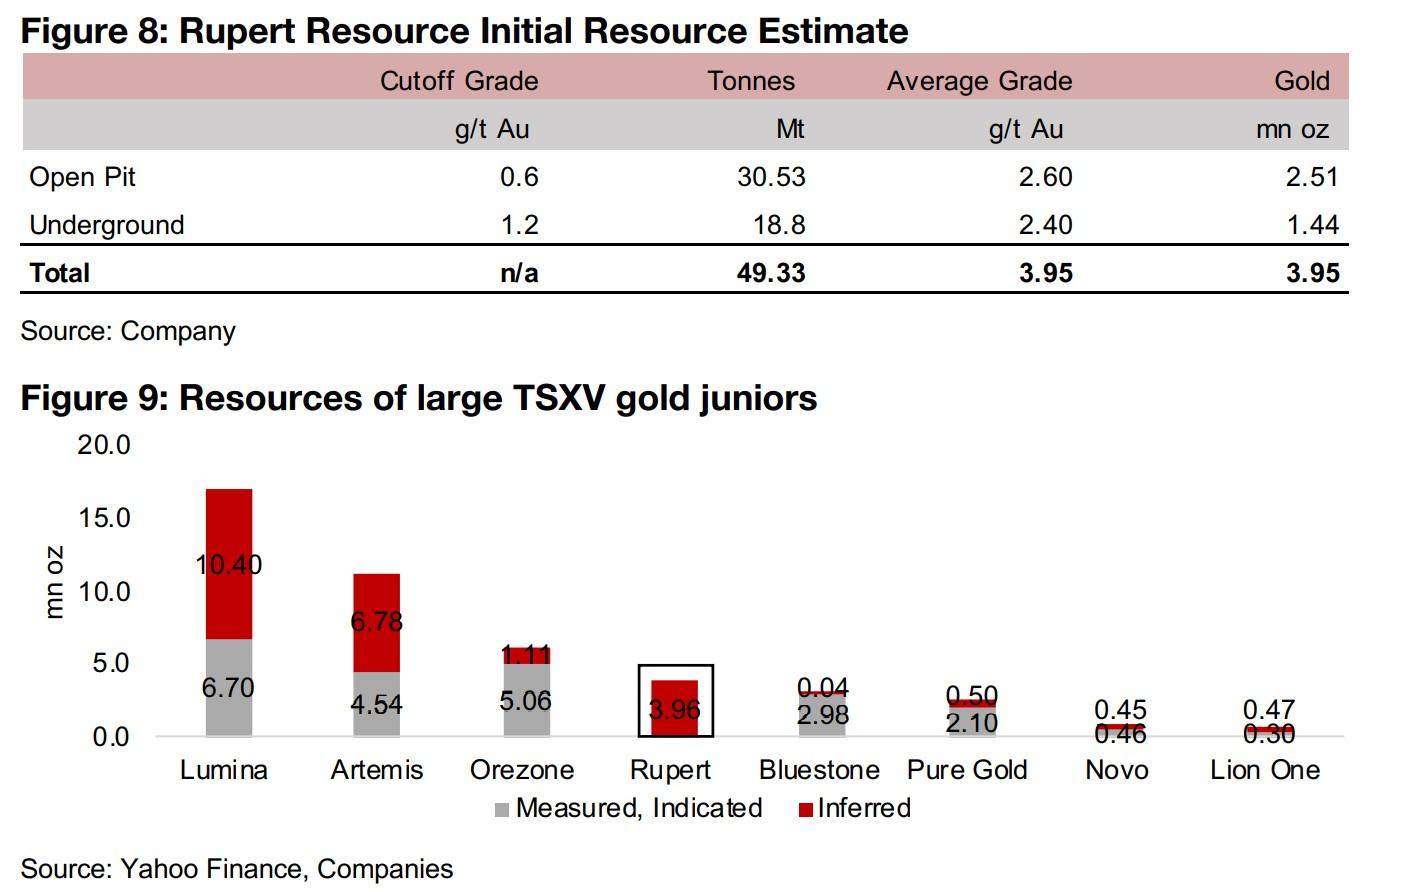 Rupert Resource declines following initial resource estimate